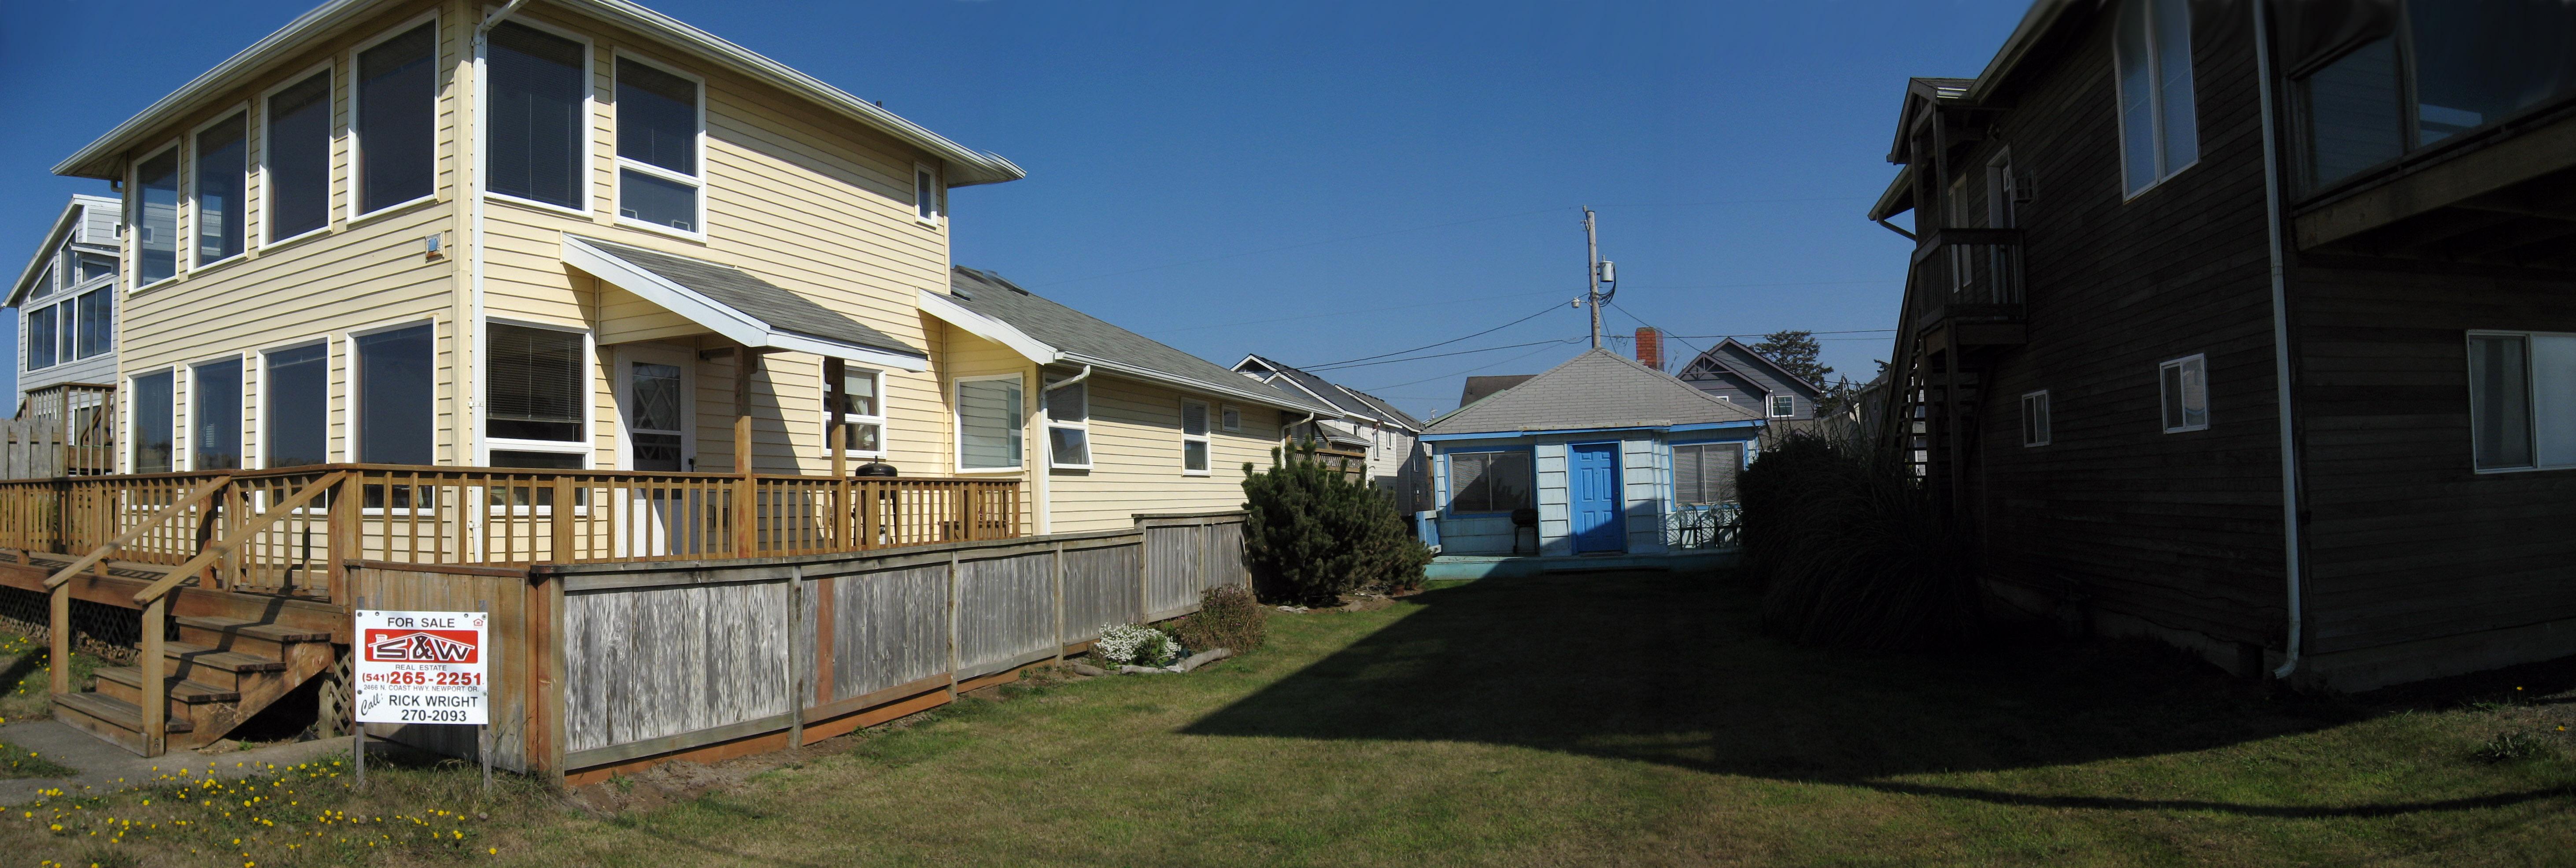 new homes near jump off joe newport oregon